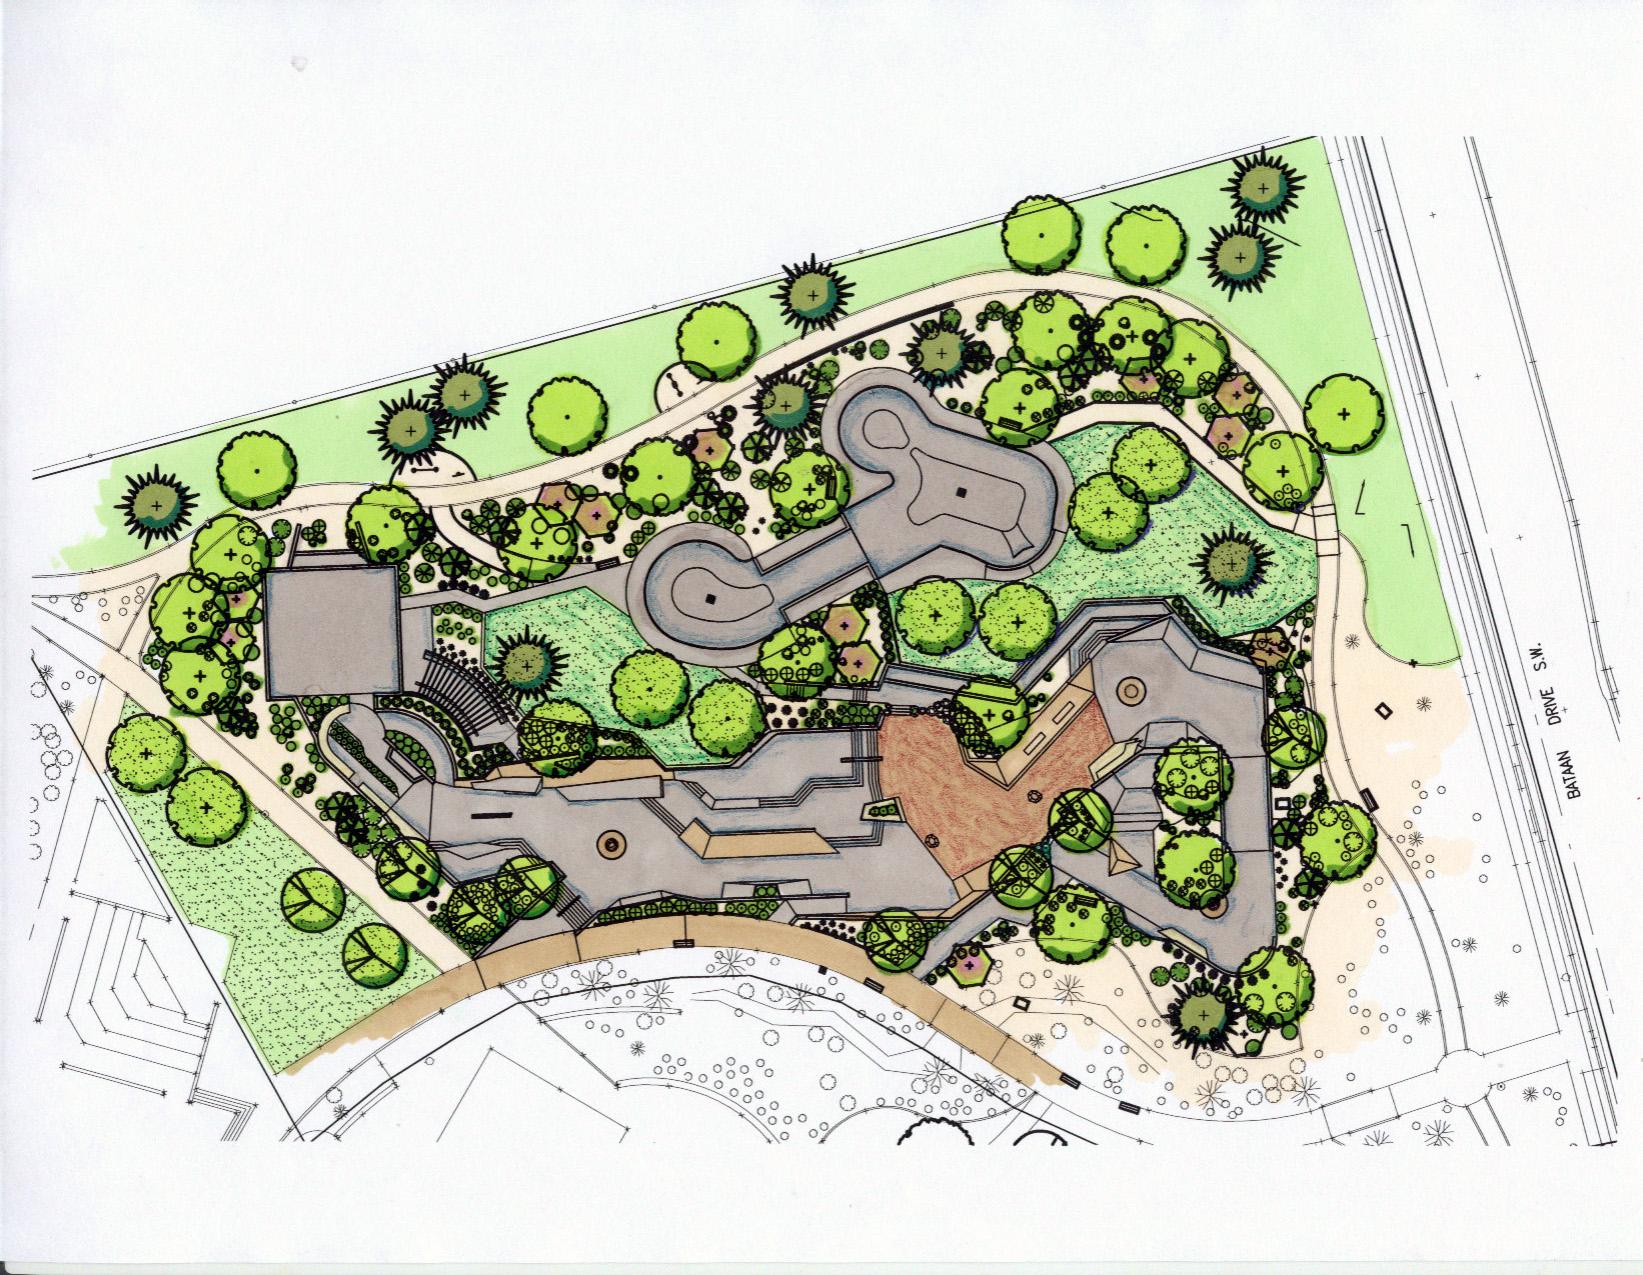 Site Plan for Alamosa Skatepark, Albuquerque, NM